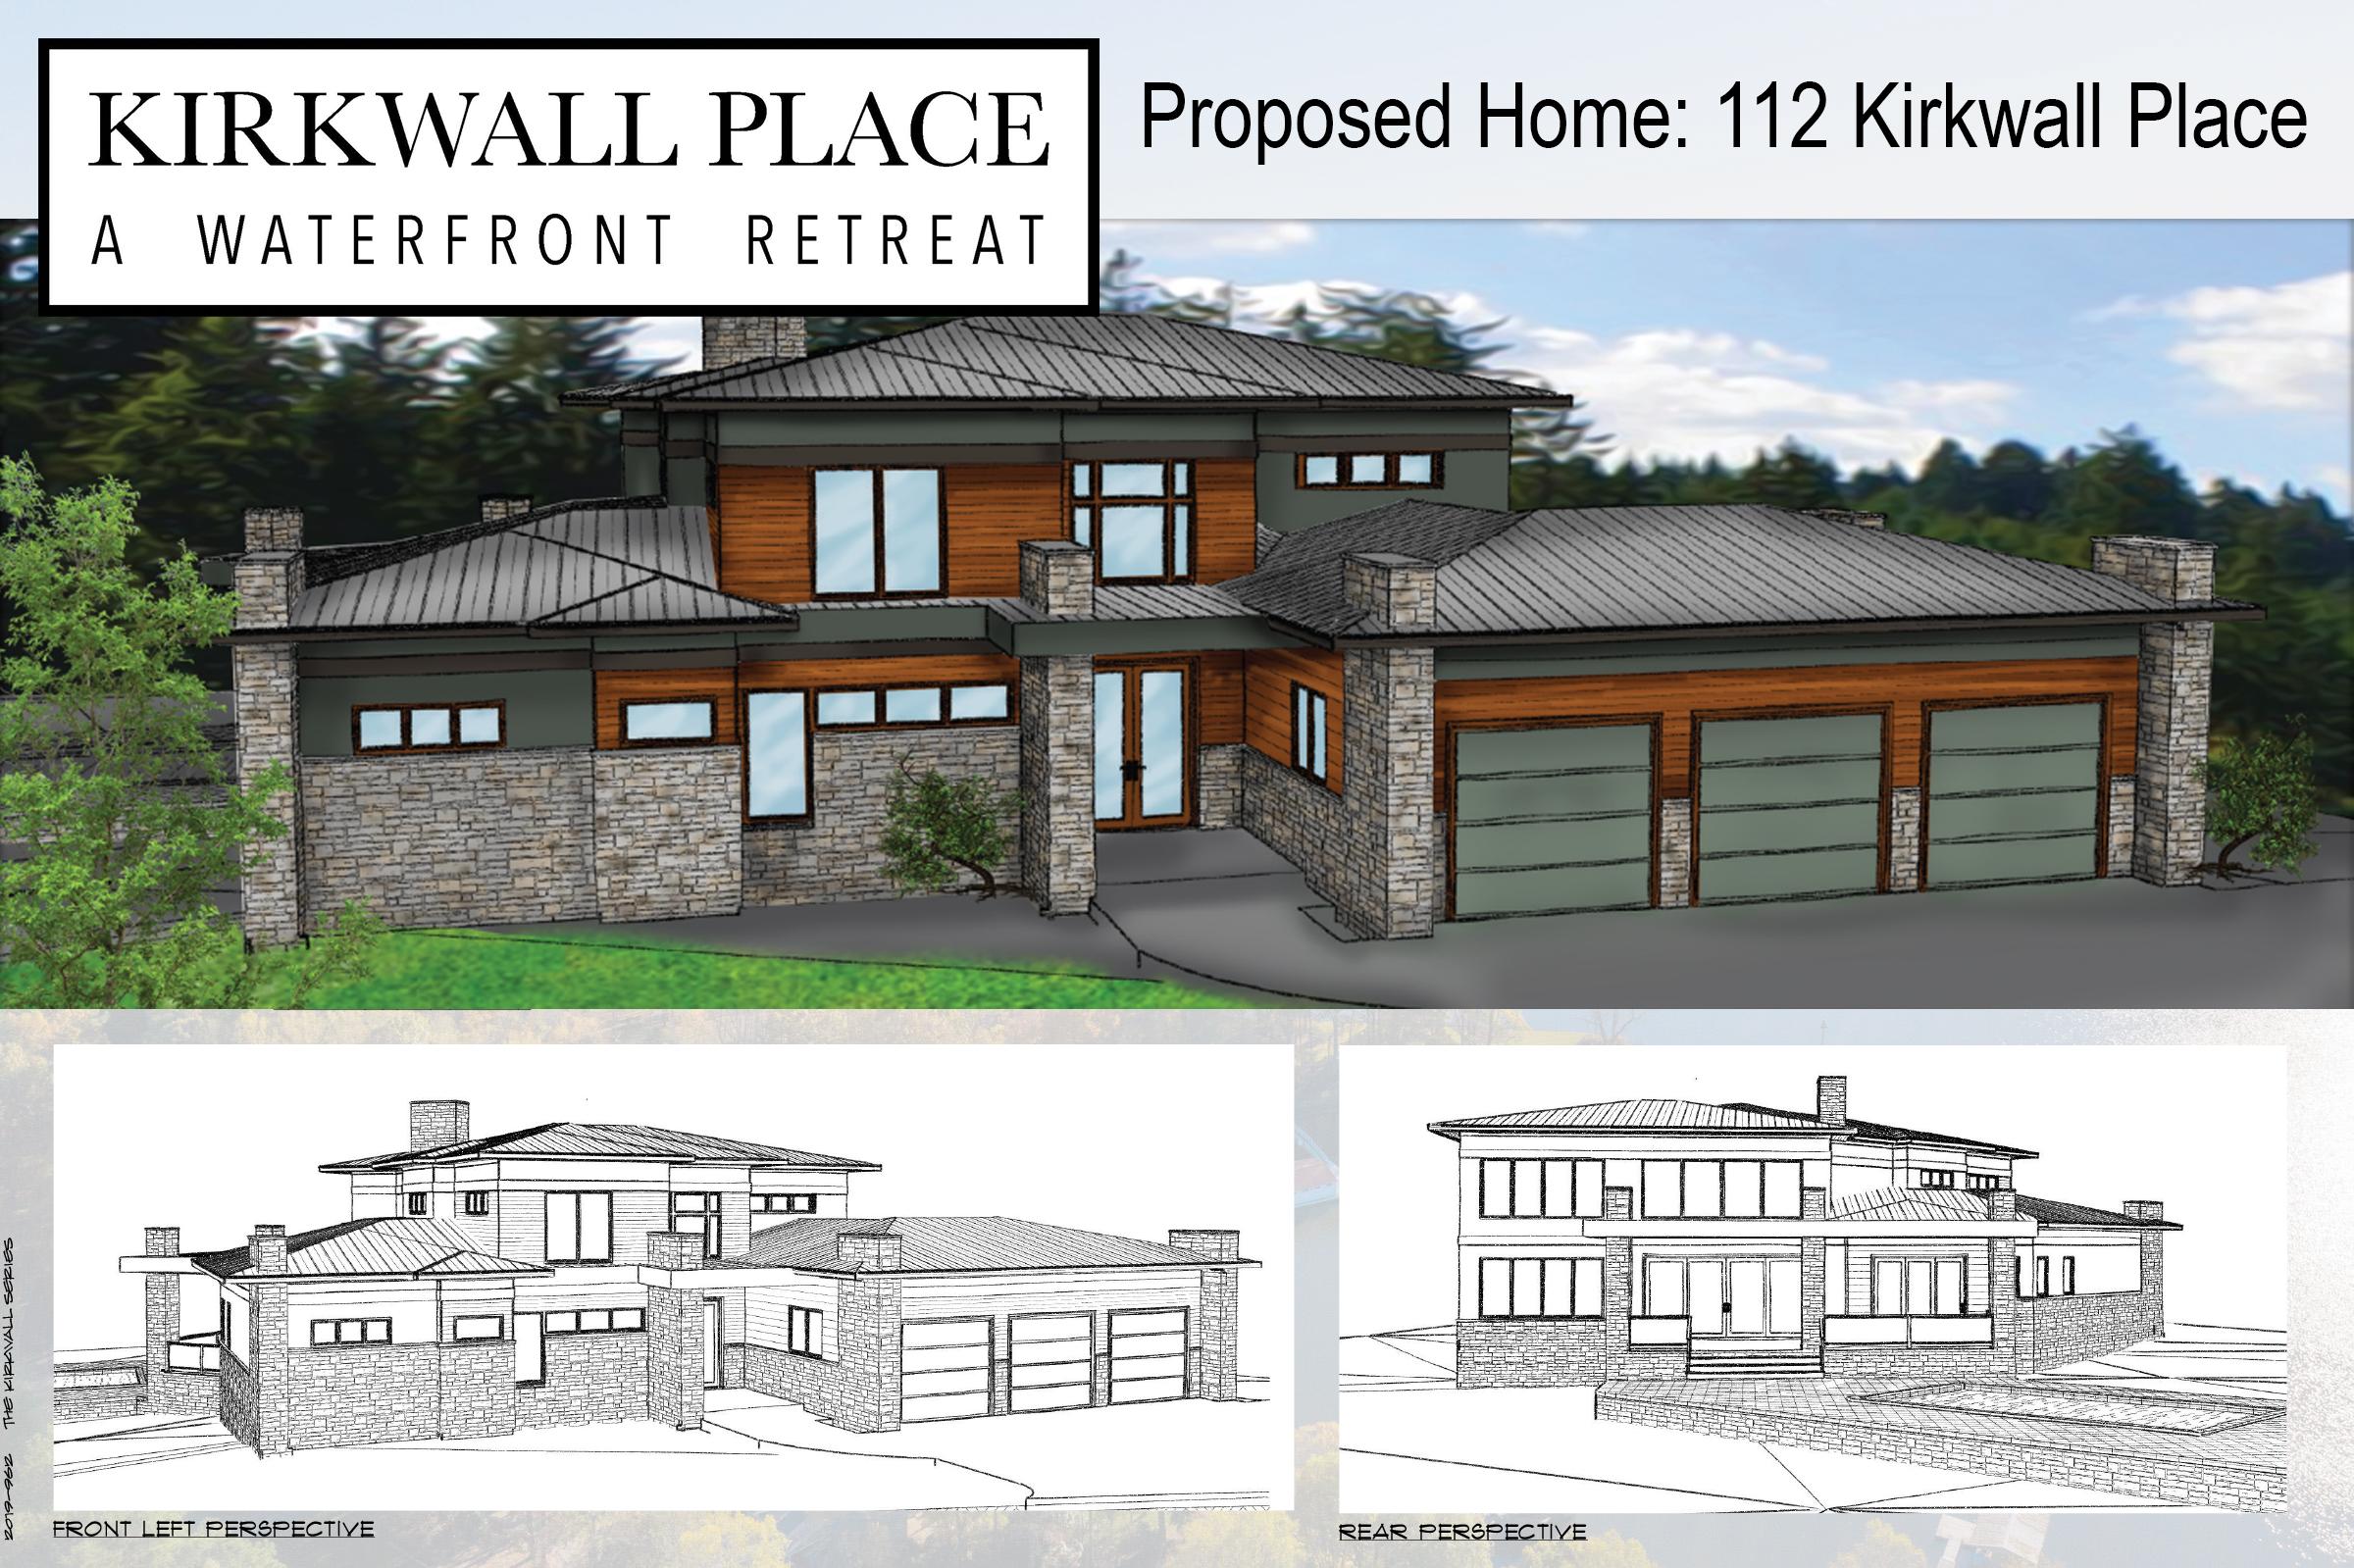 Renderings of Proposed Home - 112 Kirkwall Place